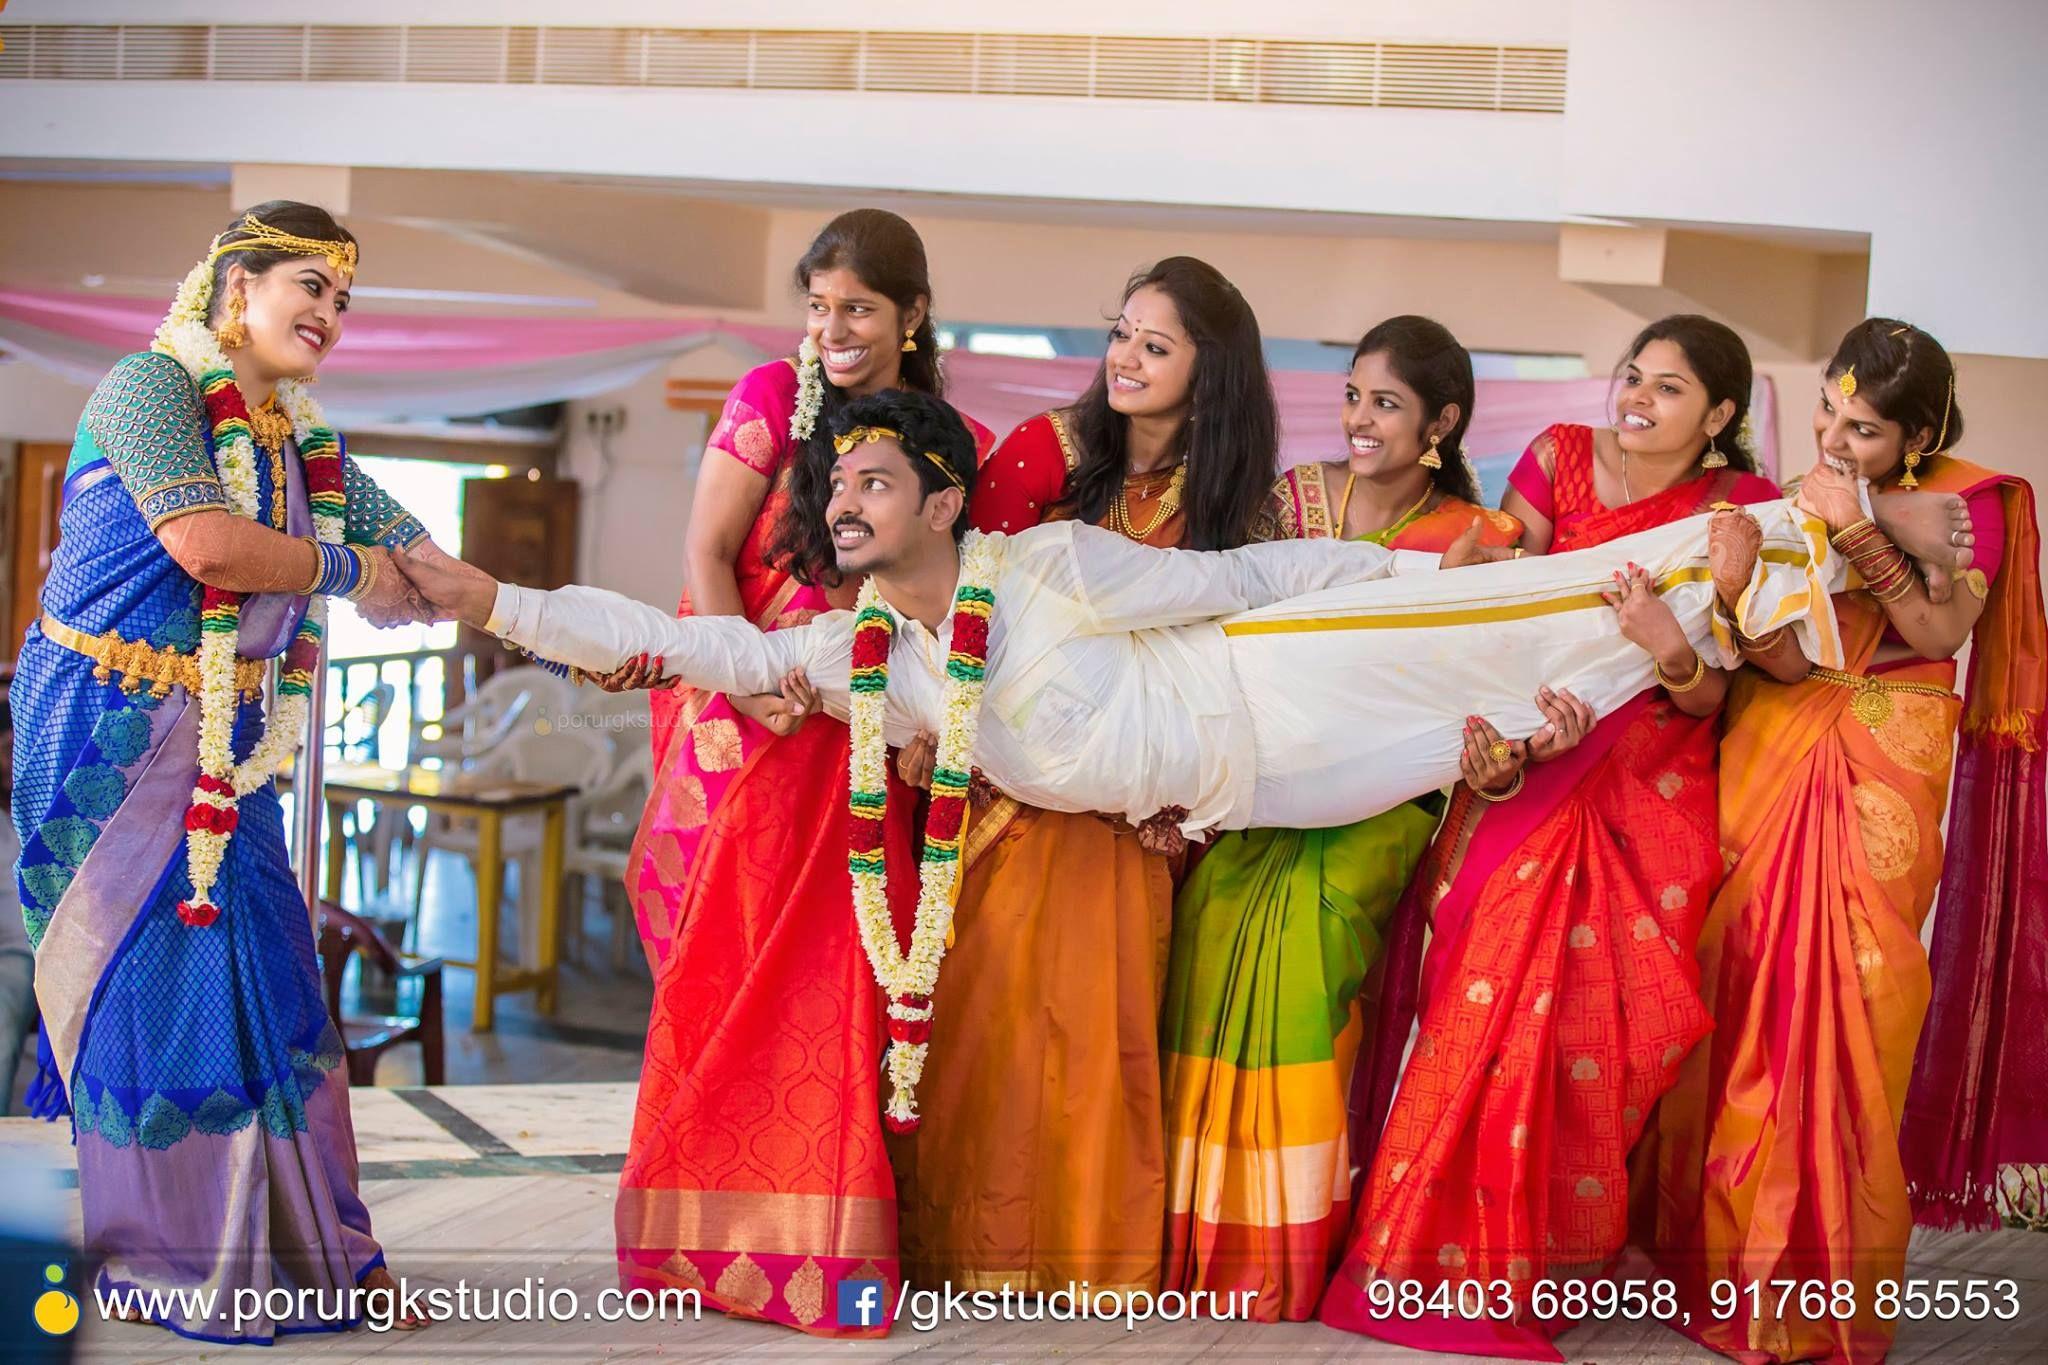 Pin On Creative Fun Shoot Best Photography In Chennai Porurgkstudio